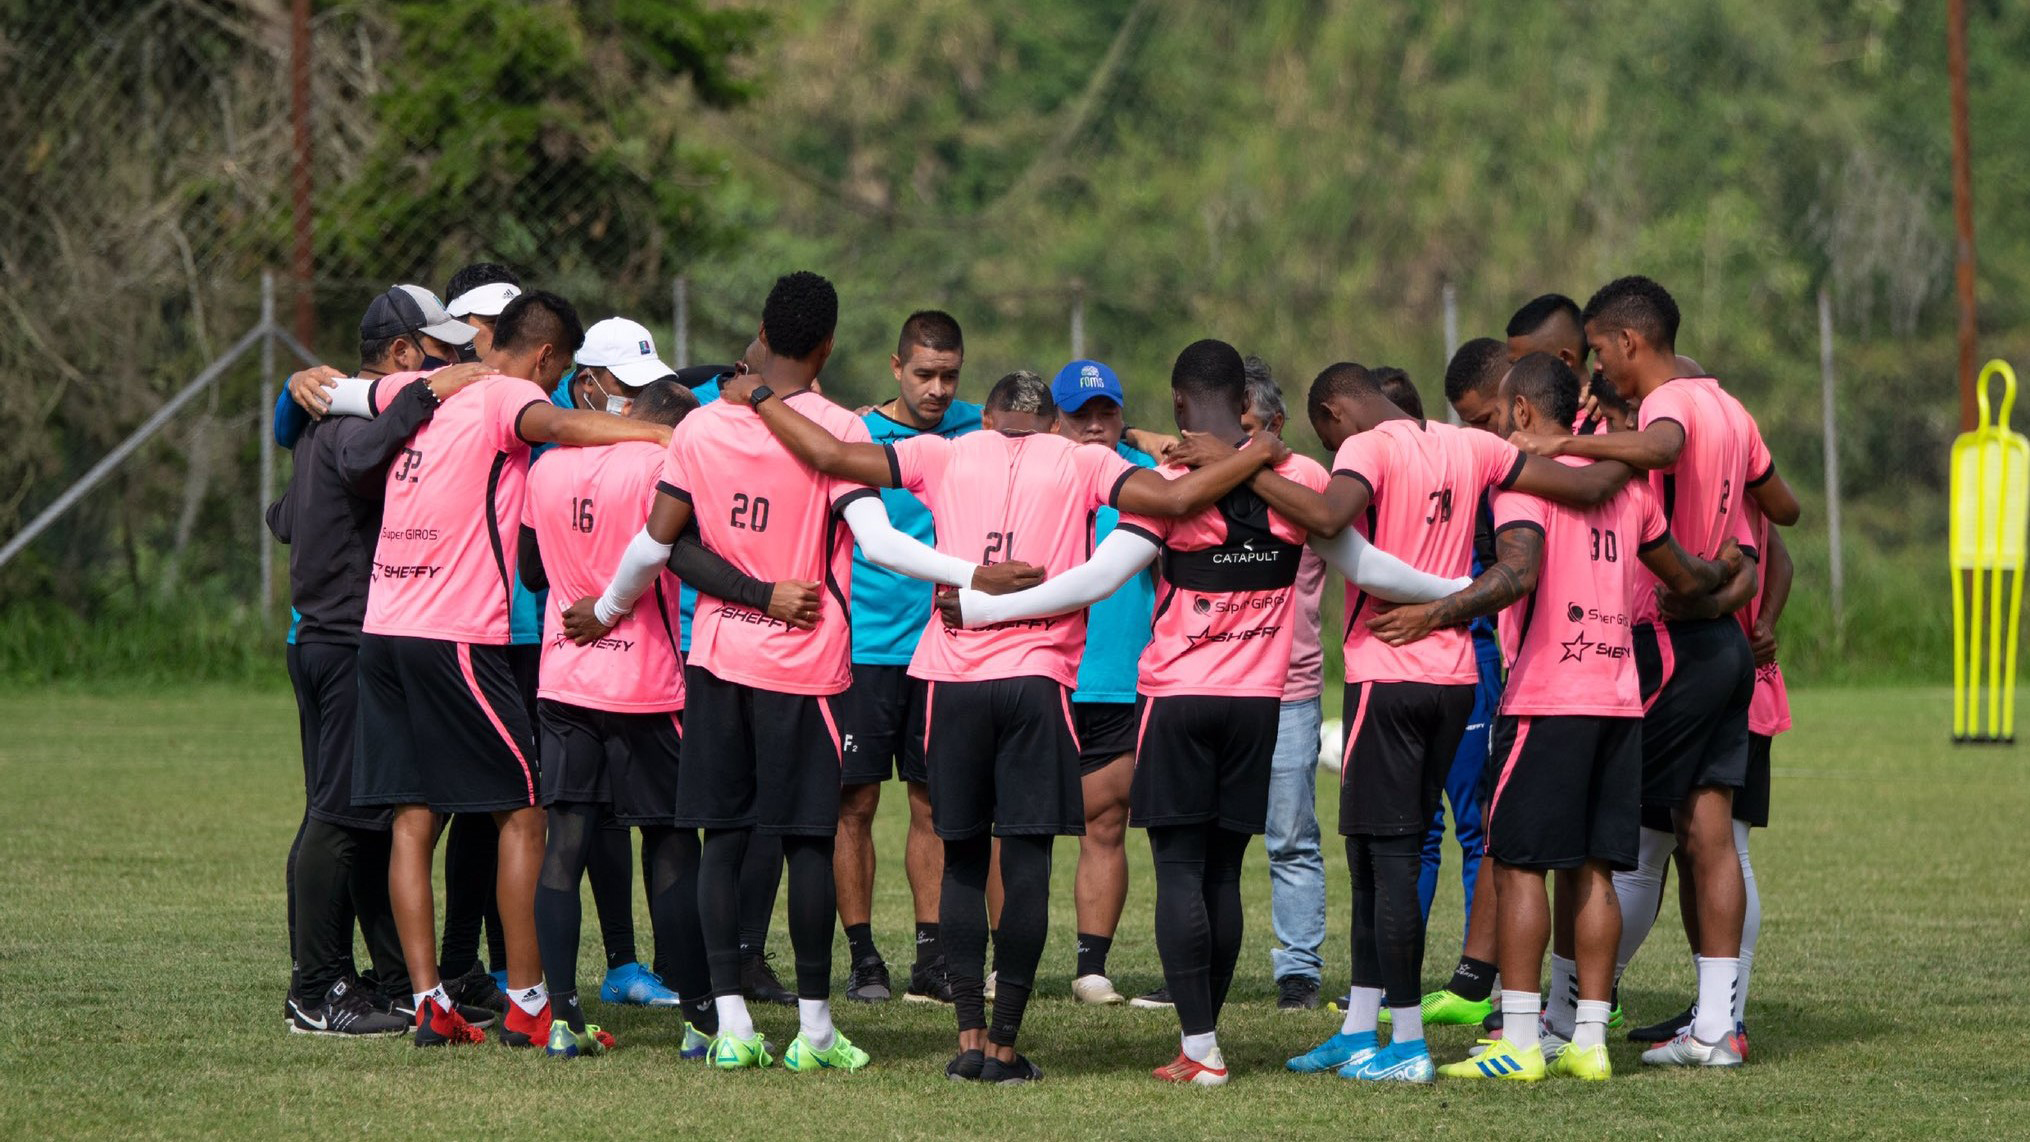 nomina-del-once-caldas-vs-junior-de-barranquilla-2016-casa-blanca-oc